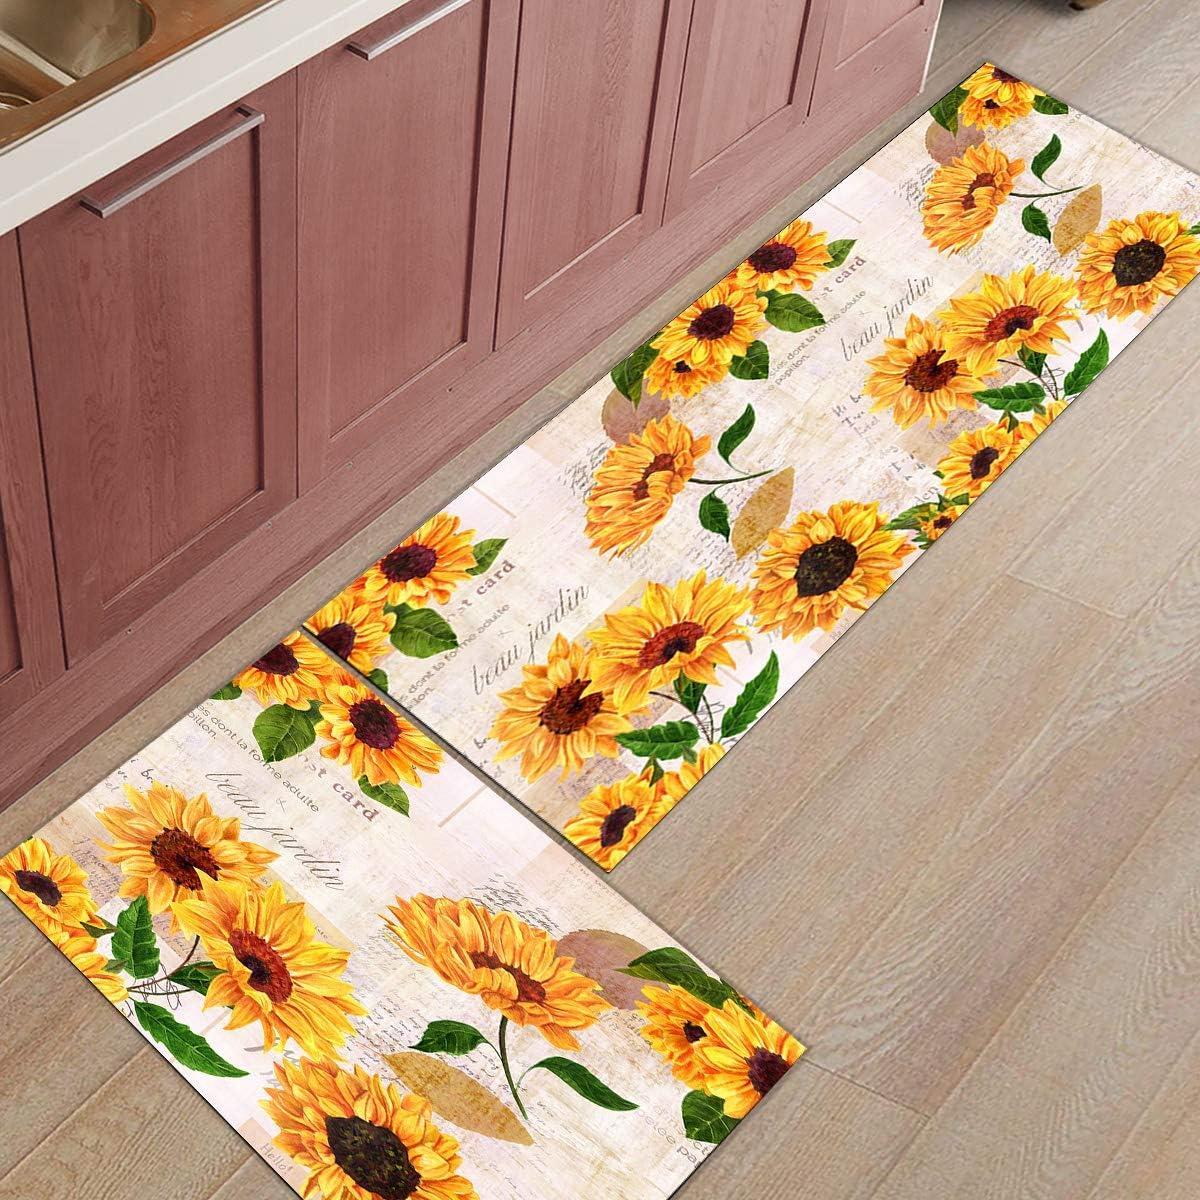 FOURFOOL Anti Fatigue Kitchen Floor Mat Set 9pcs,Yellow Sunflower Clipping  Retro Old Newspaper Farmhouse Sunflowers Wild Flowers,Non Slip Cushioned ...